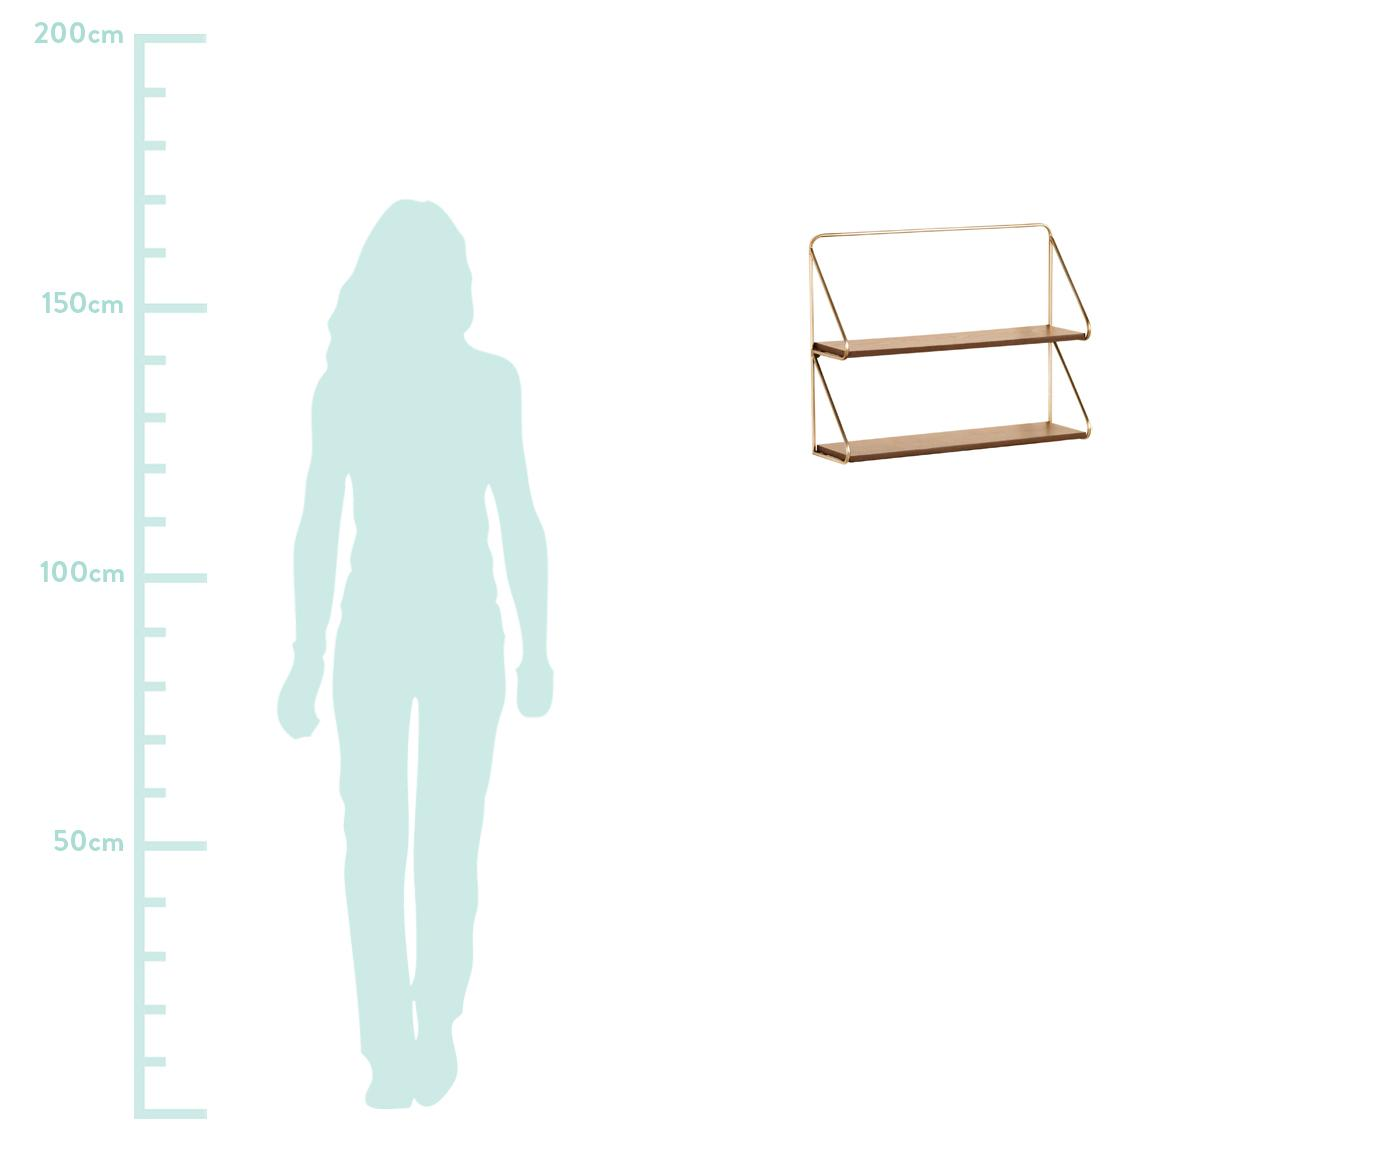 Kleines Wandregal Catrina, Gestell: Metall, lackiert, Braun, Goldfarben, 51 x 42 cm